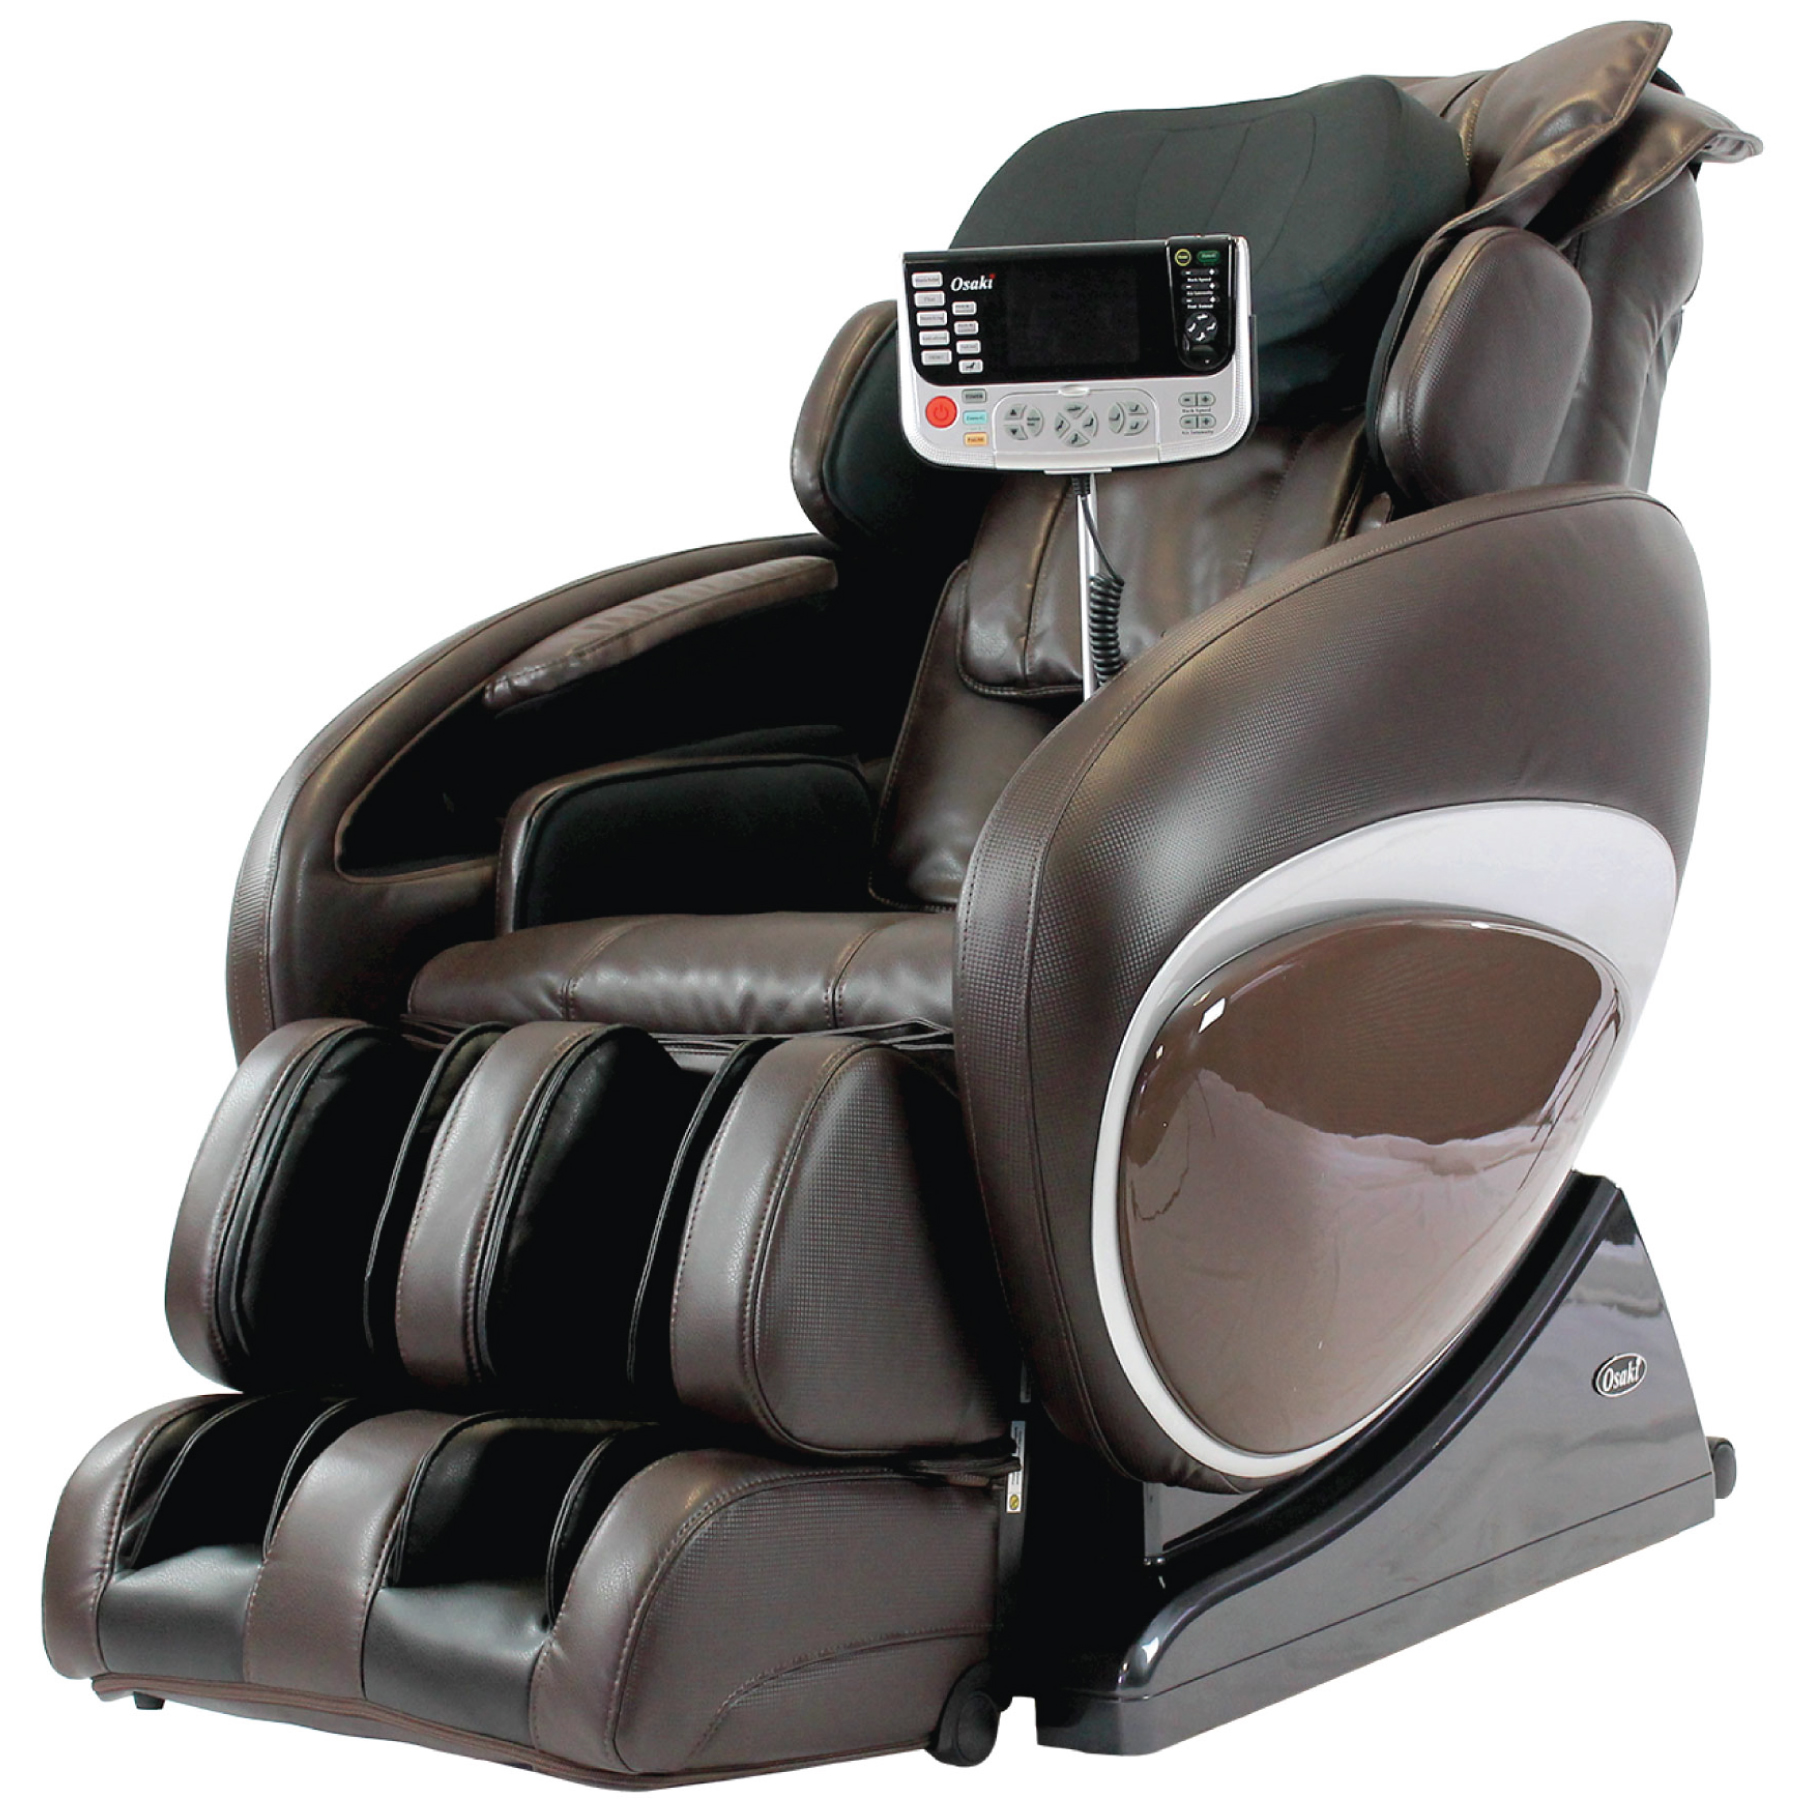 osaki os-4000t zero gravity massage chair, brown, computer body